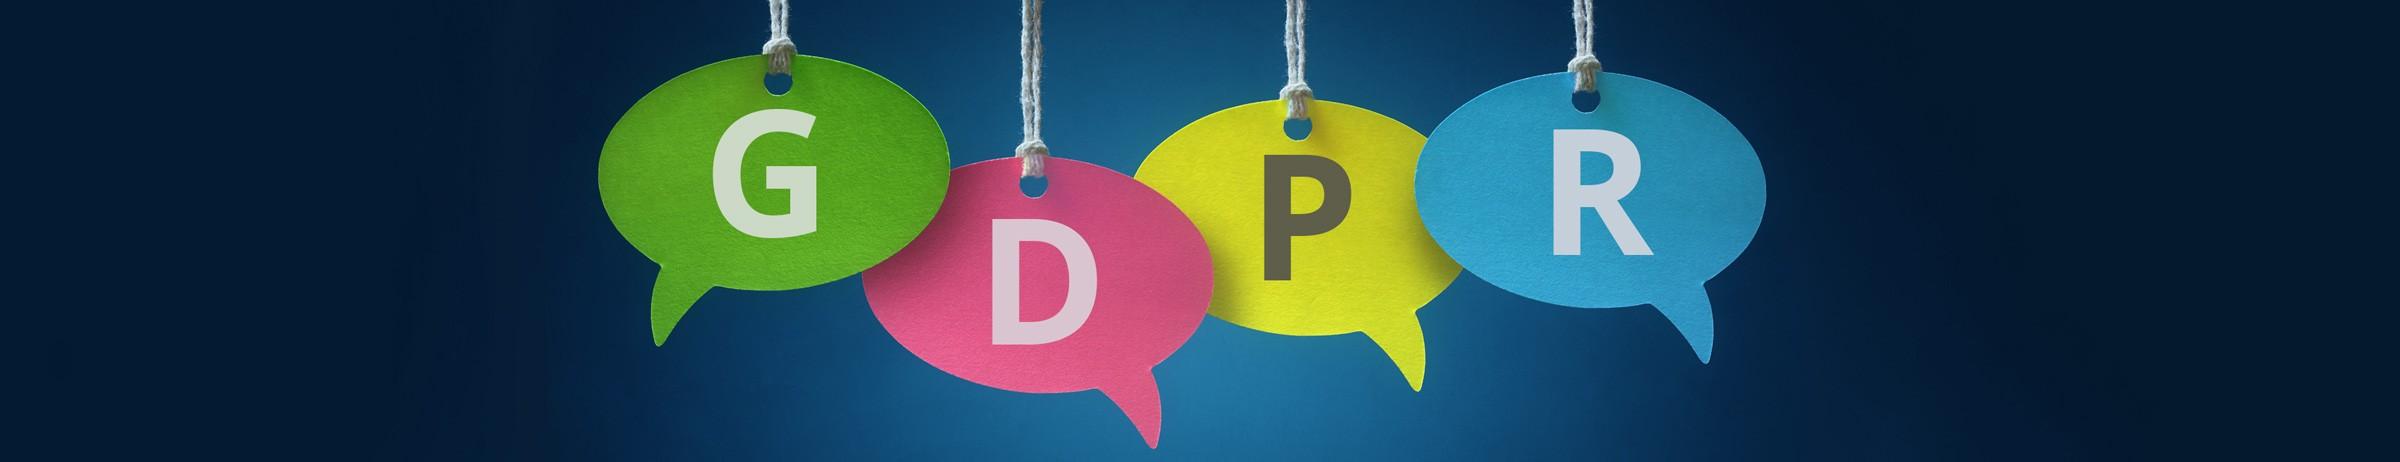 GDPR-kirjaimet puhekuplissa